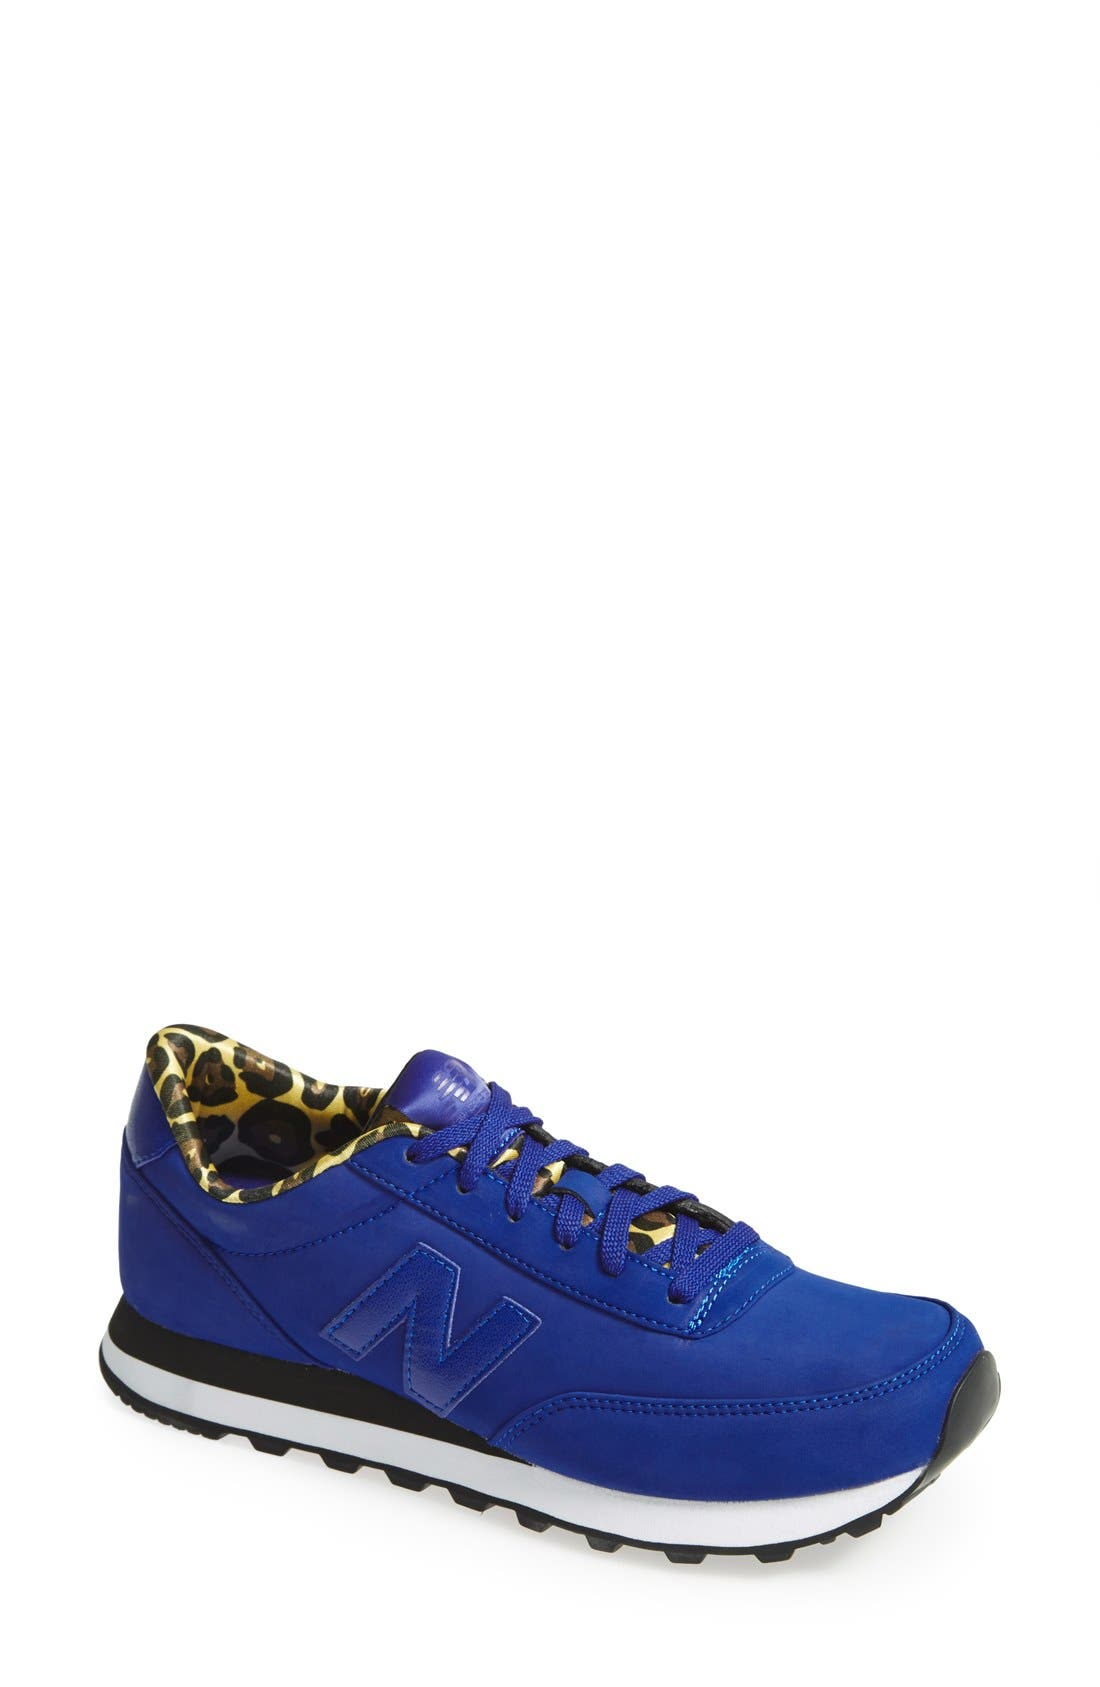 Main Image - New Balance '501' Sneaker (Women)